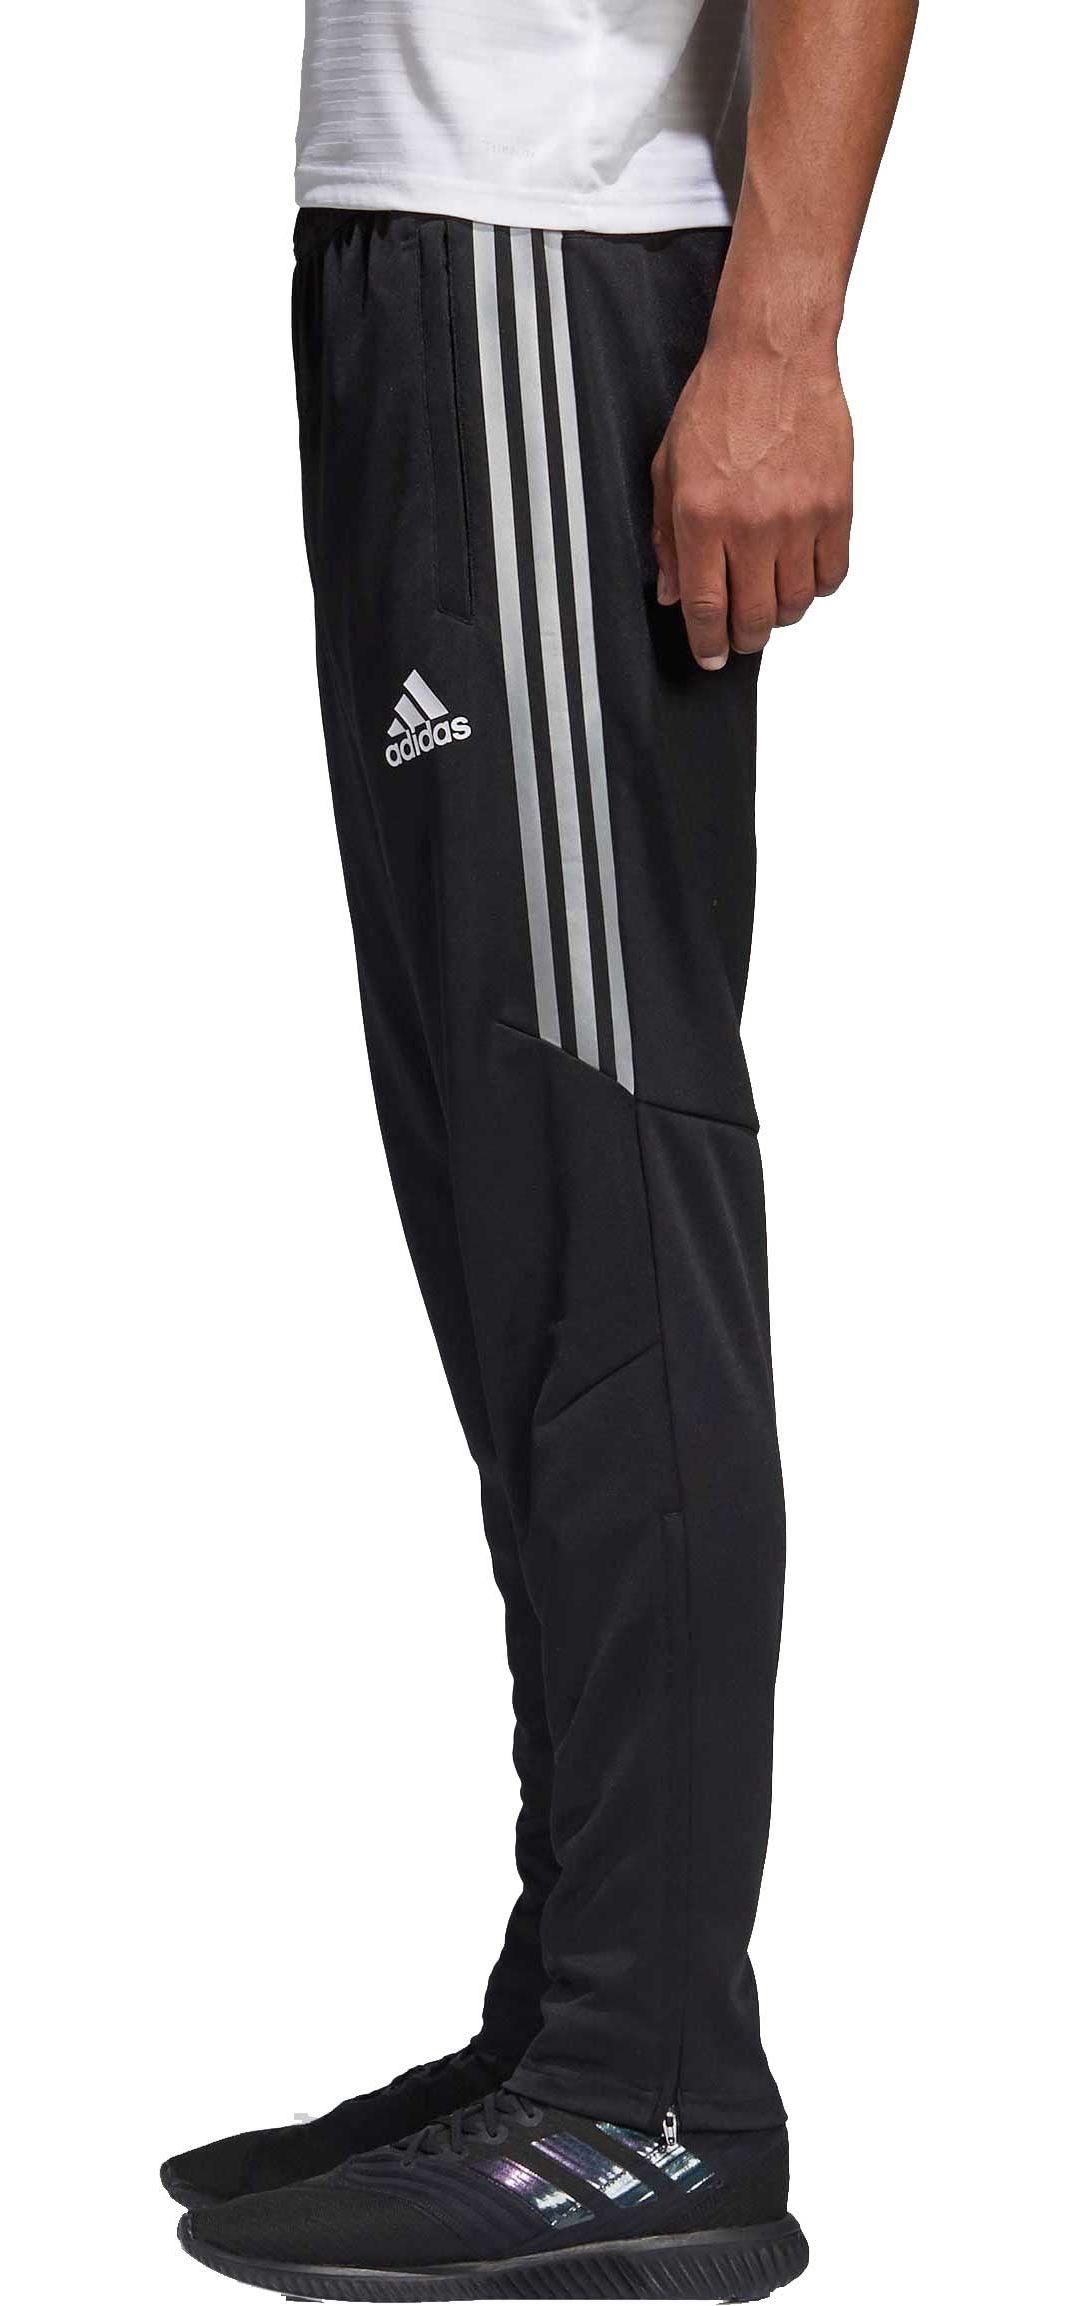 4b3a4ec55aff adidas Men s Tiro 17 Metallic Training Pants 1